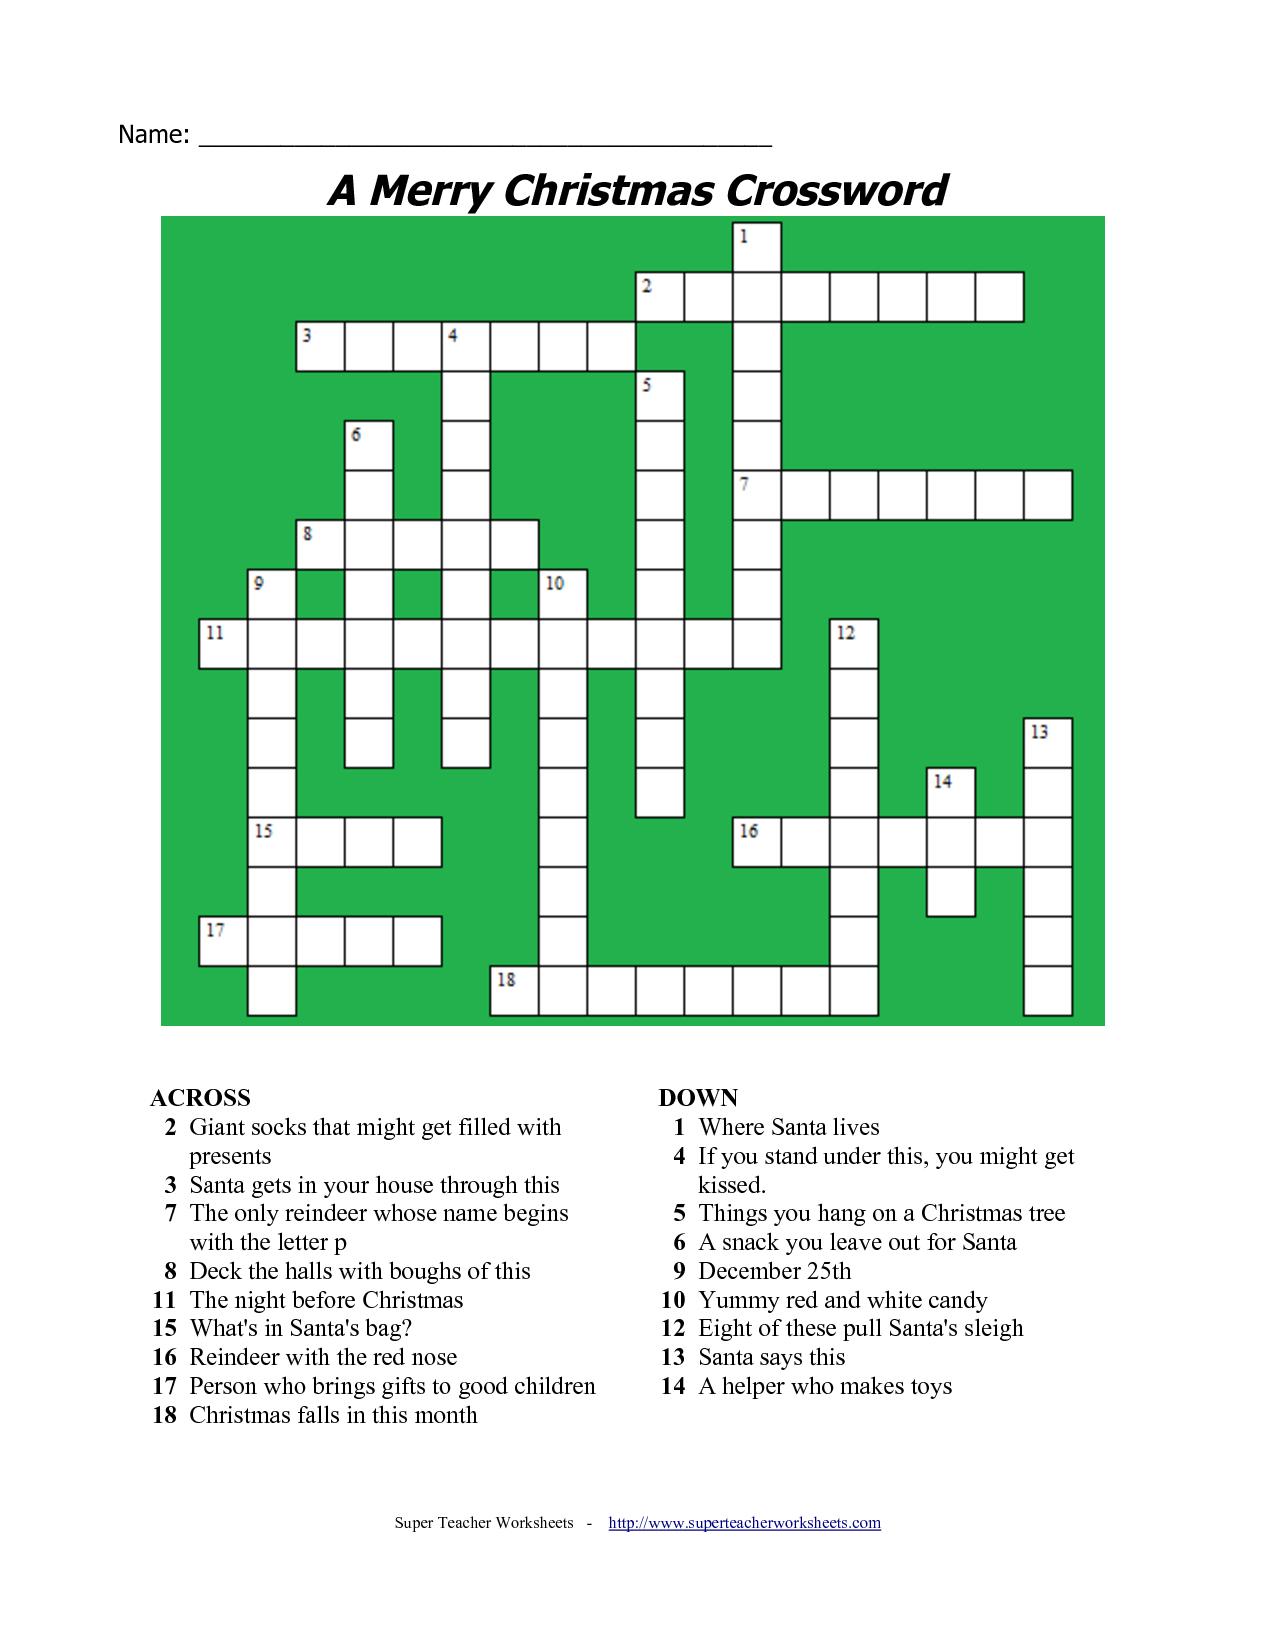 20 Fun Printable Christmas Crossword Puzzles   Kittybabylove - Printable Xmas Crossword Puzzles